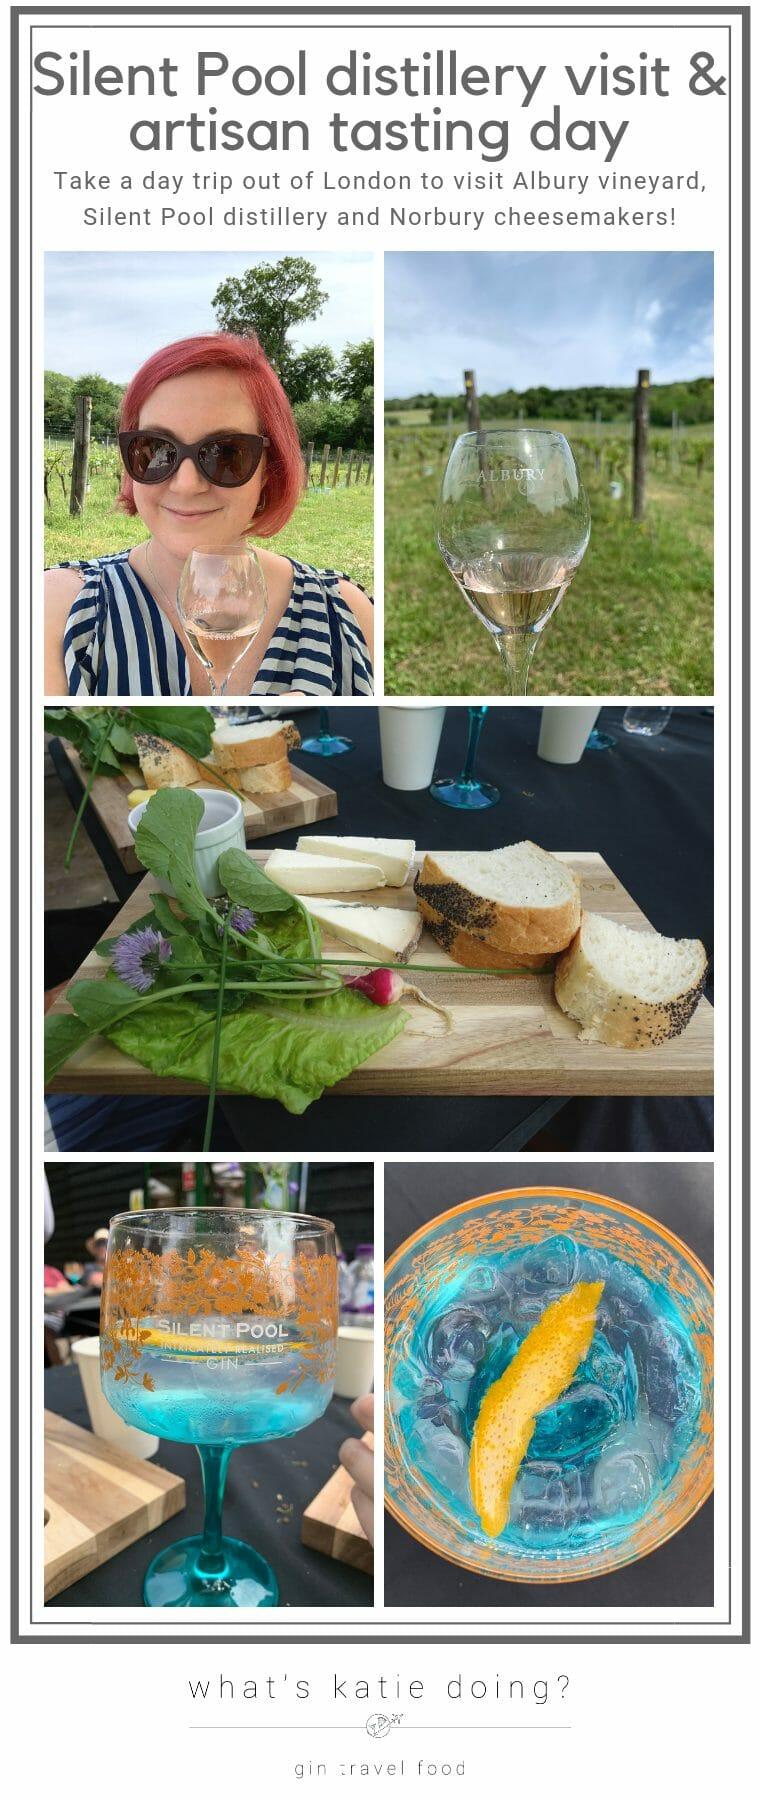 Silent Pool distillery visit & artisan tasting day